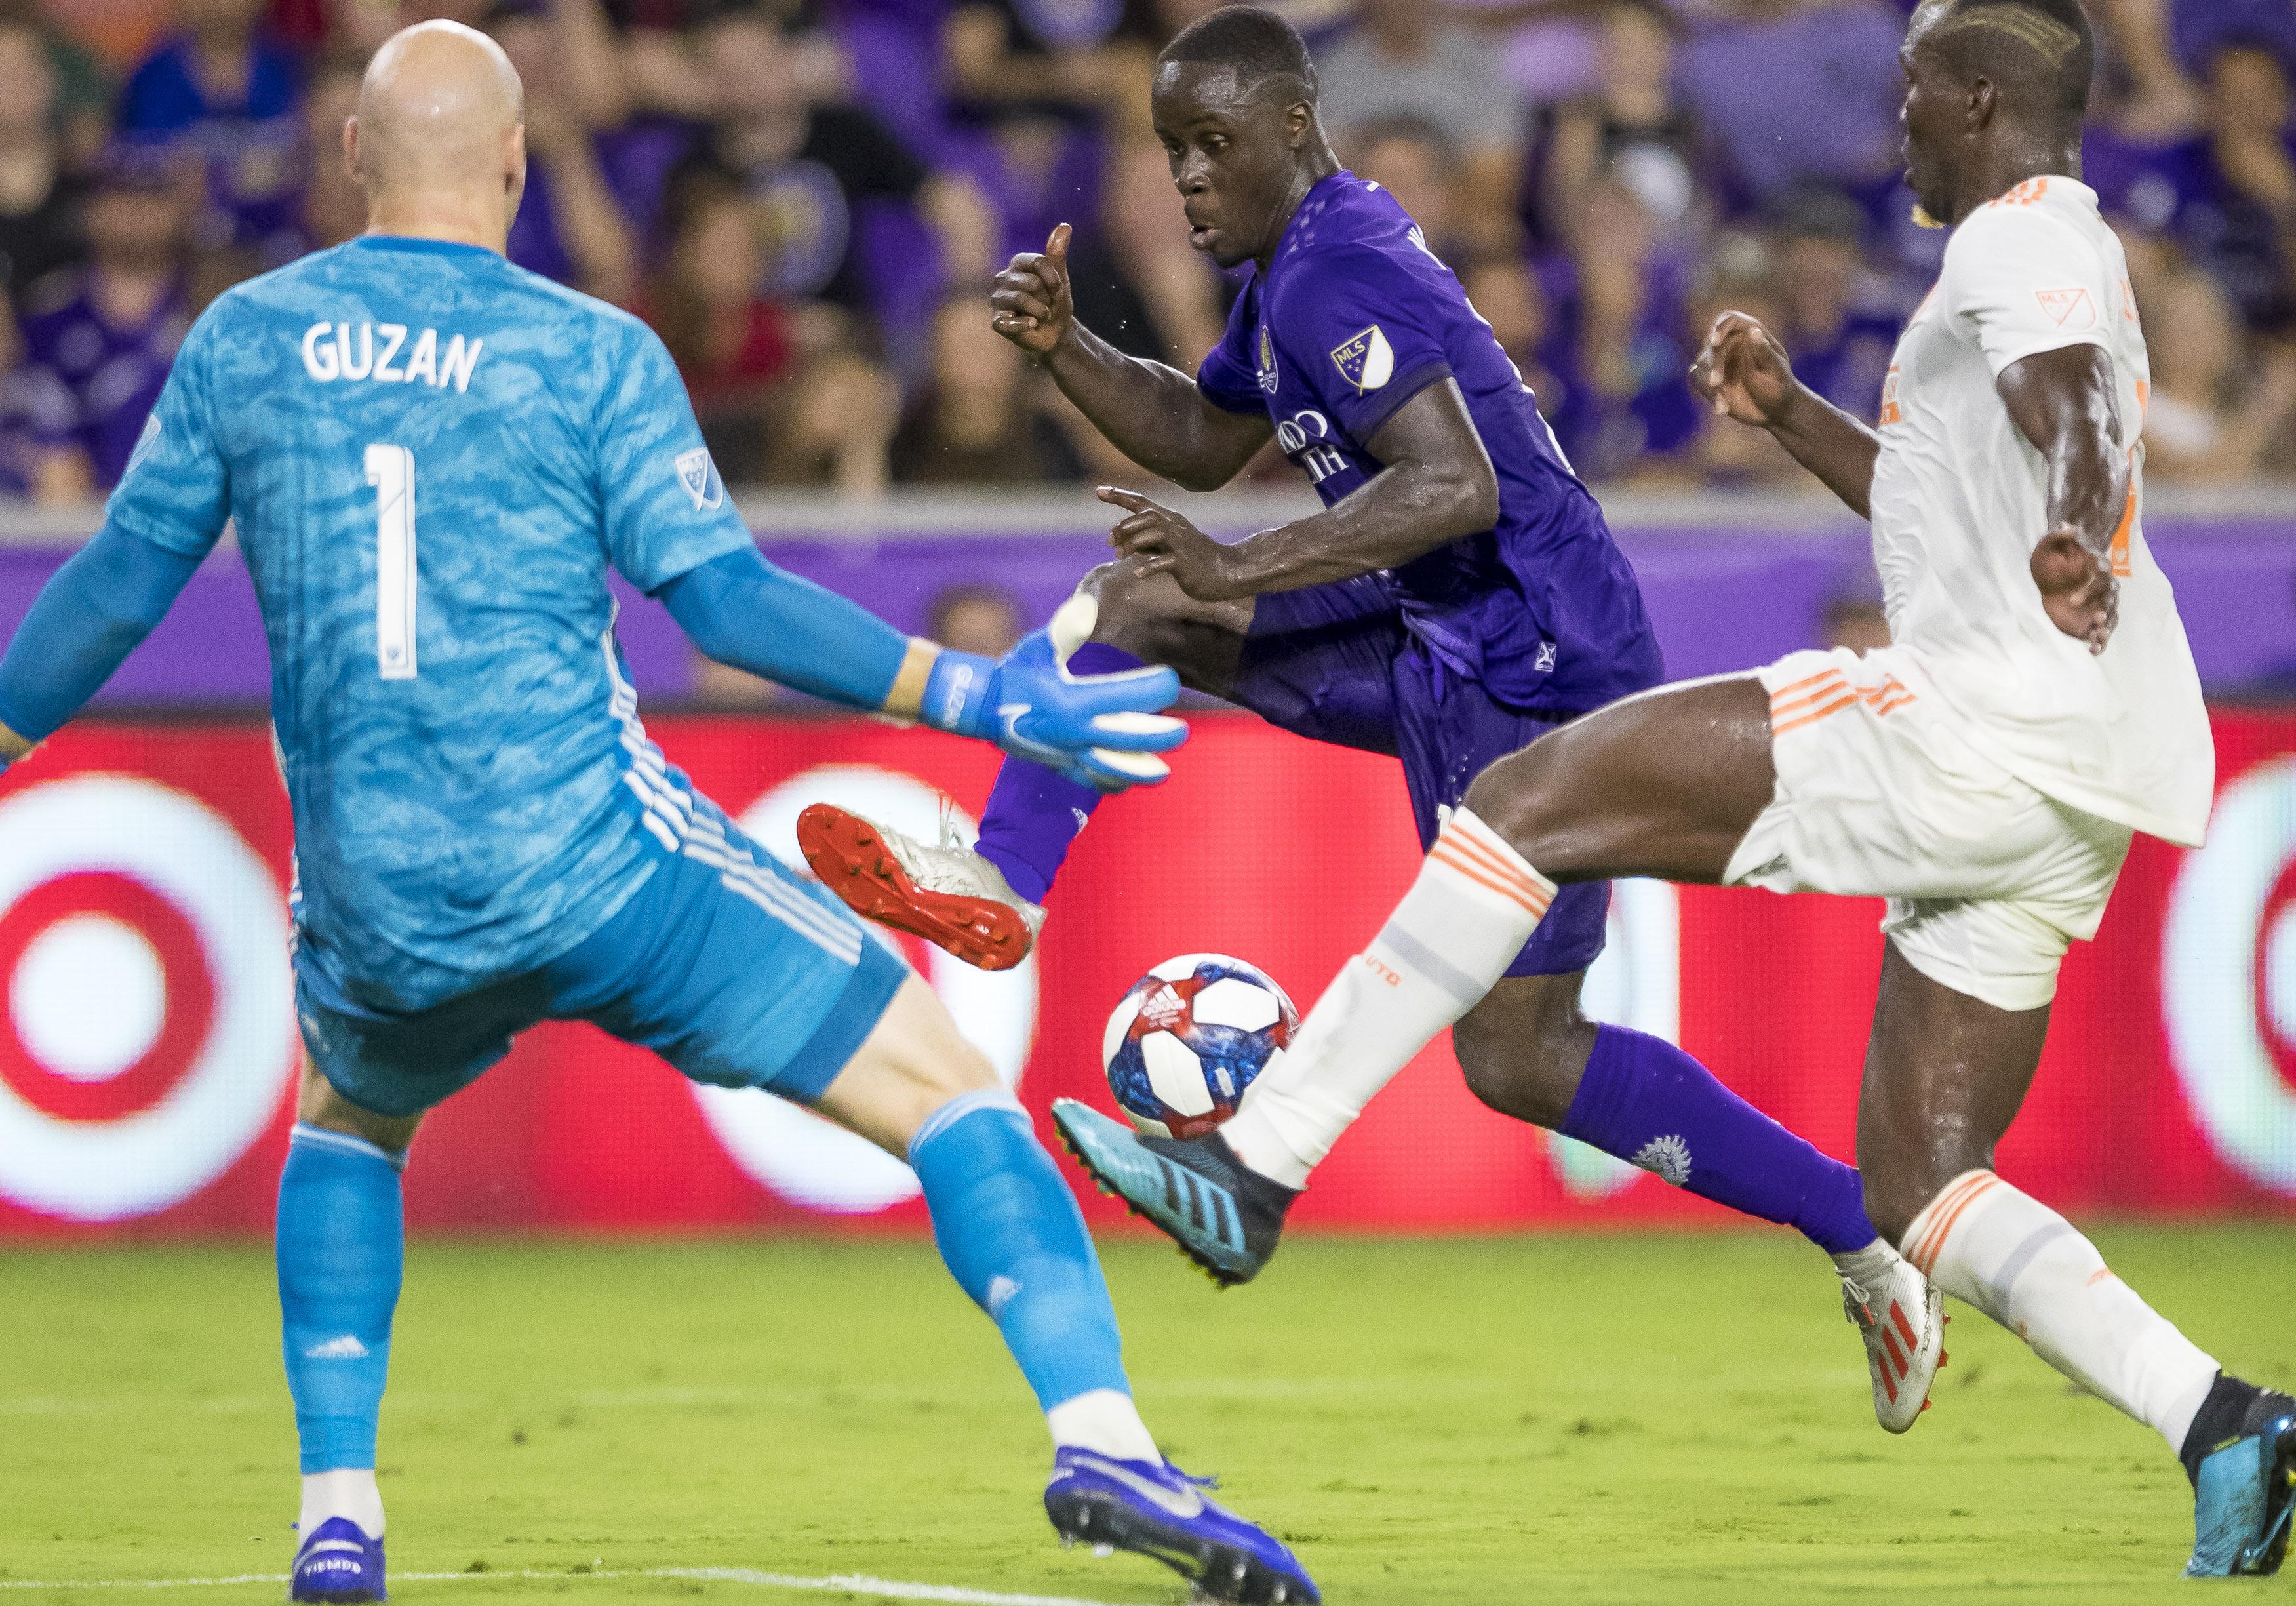 SOCCER: AUG 23 MLS - Atlanta United FC at Orlando City SC